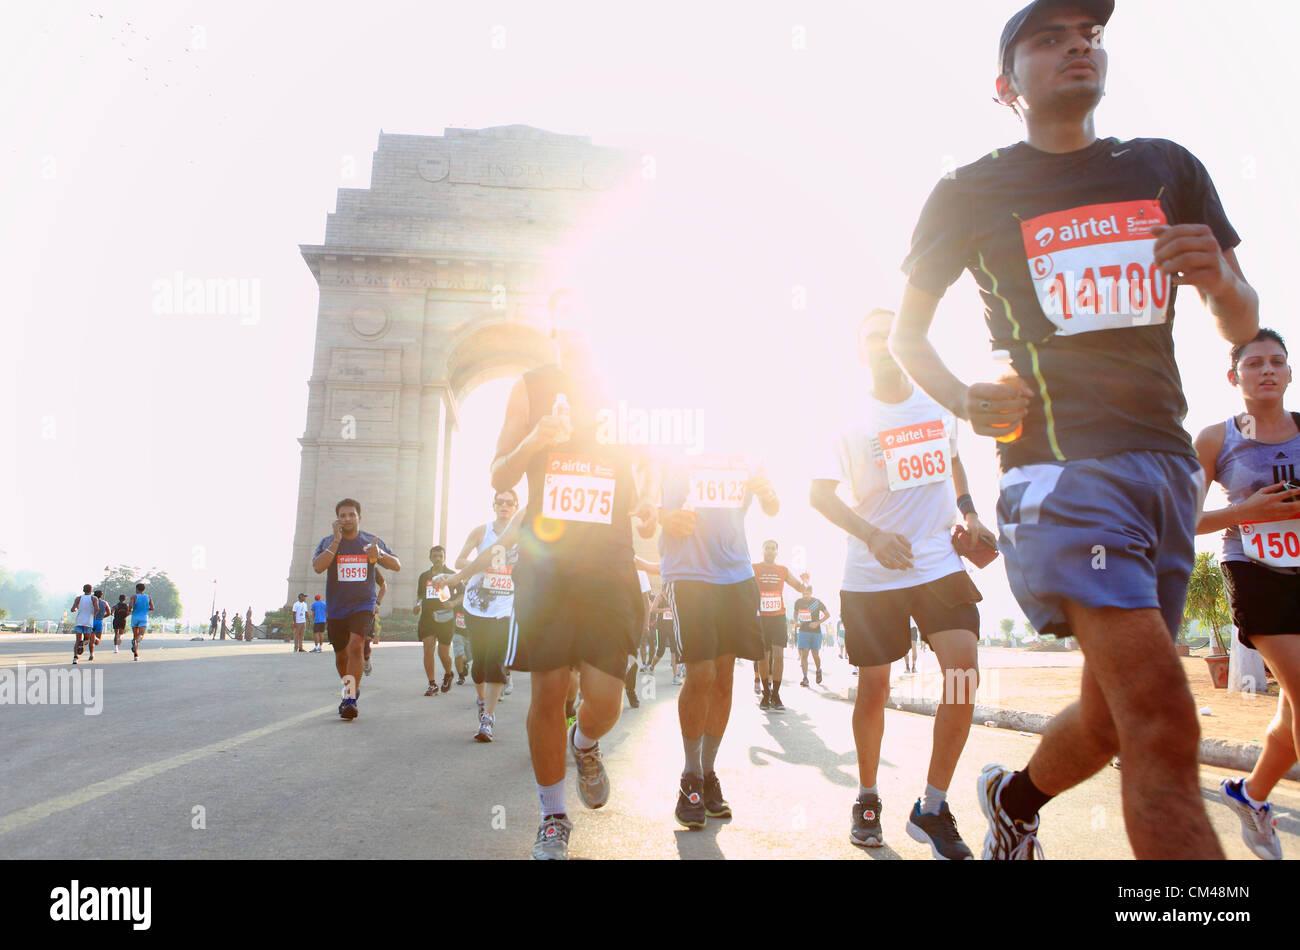 Set 30, 2012 - Nova Deli, Índia - Nova Délhi residentes participar na Meia Maratona de Nova Deli como Imagens de Stock